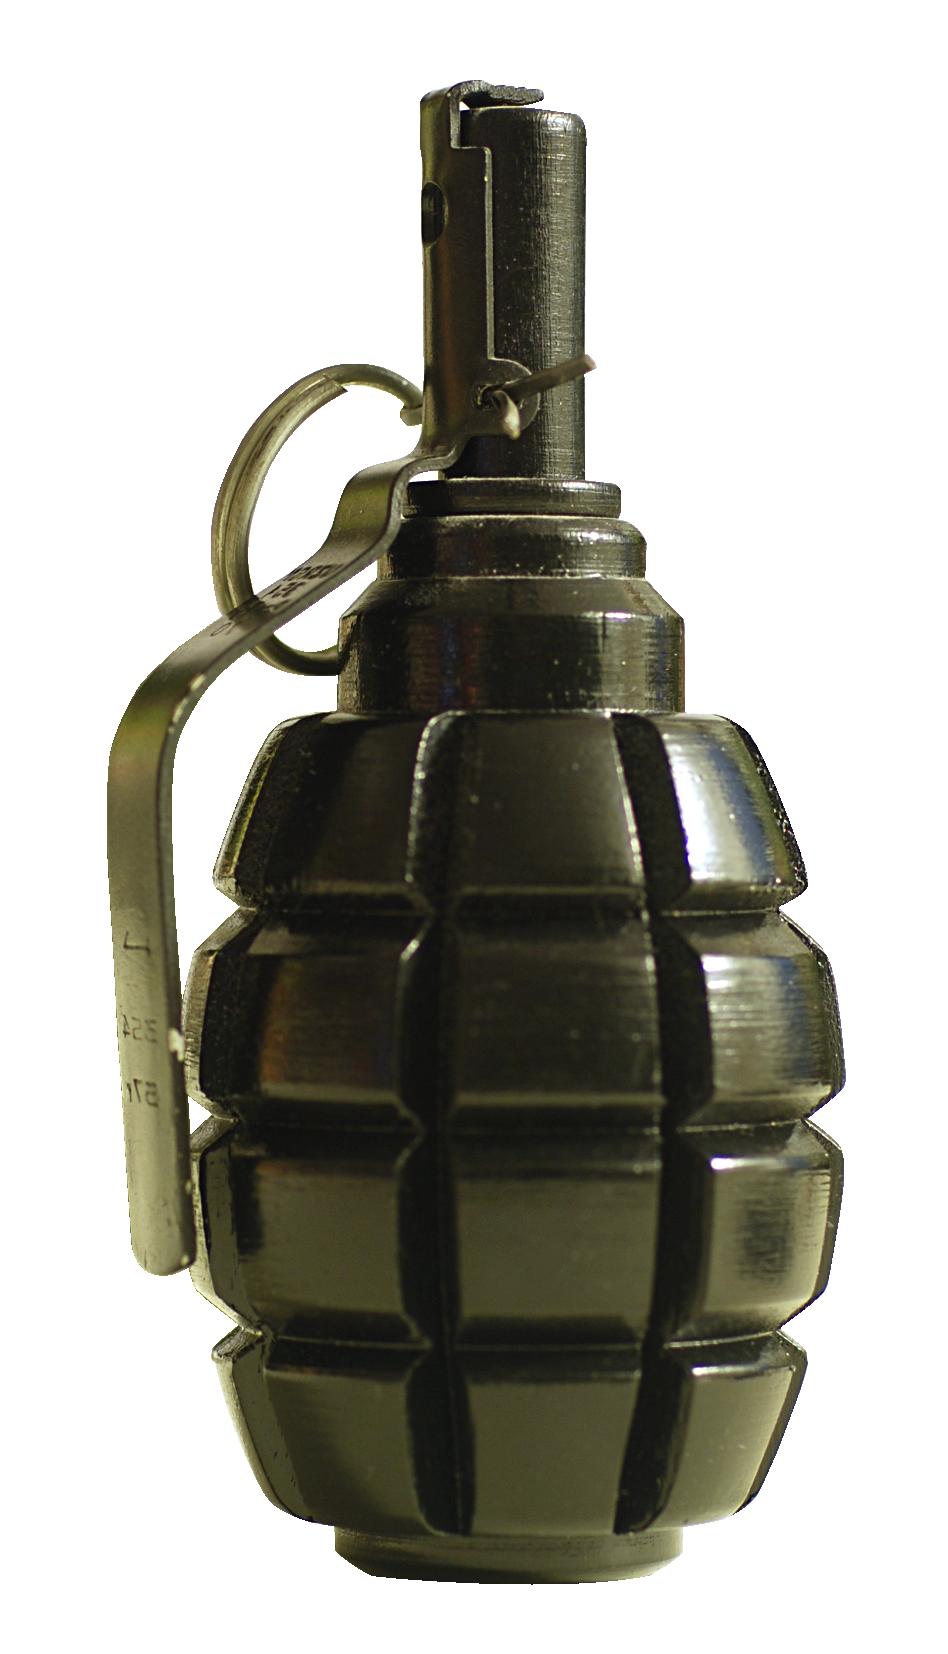 Hand Grenade Png Transparent Image - Grenade, Transparent background PNG HD thumbnail